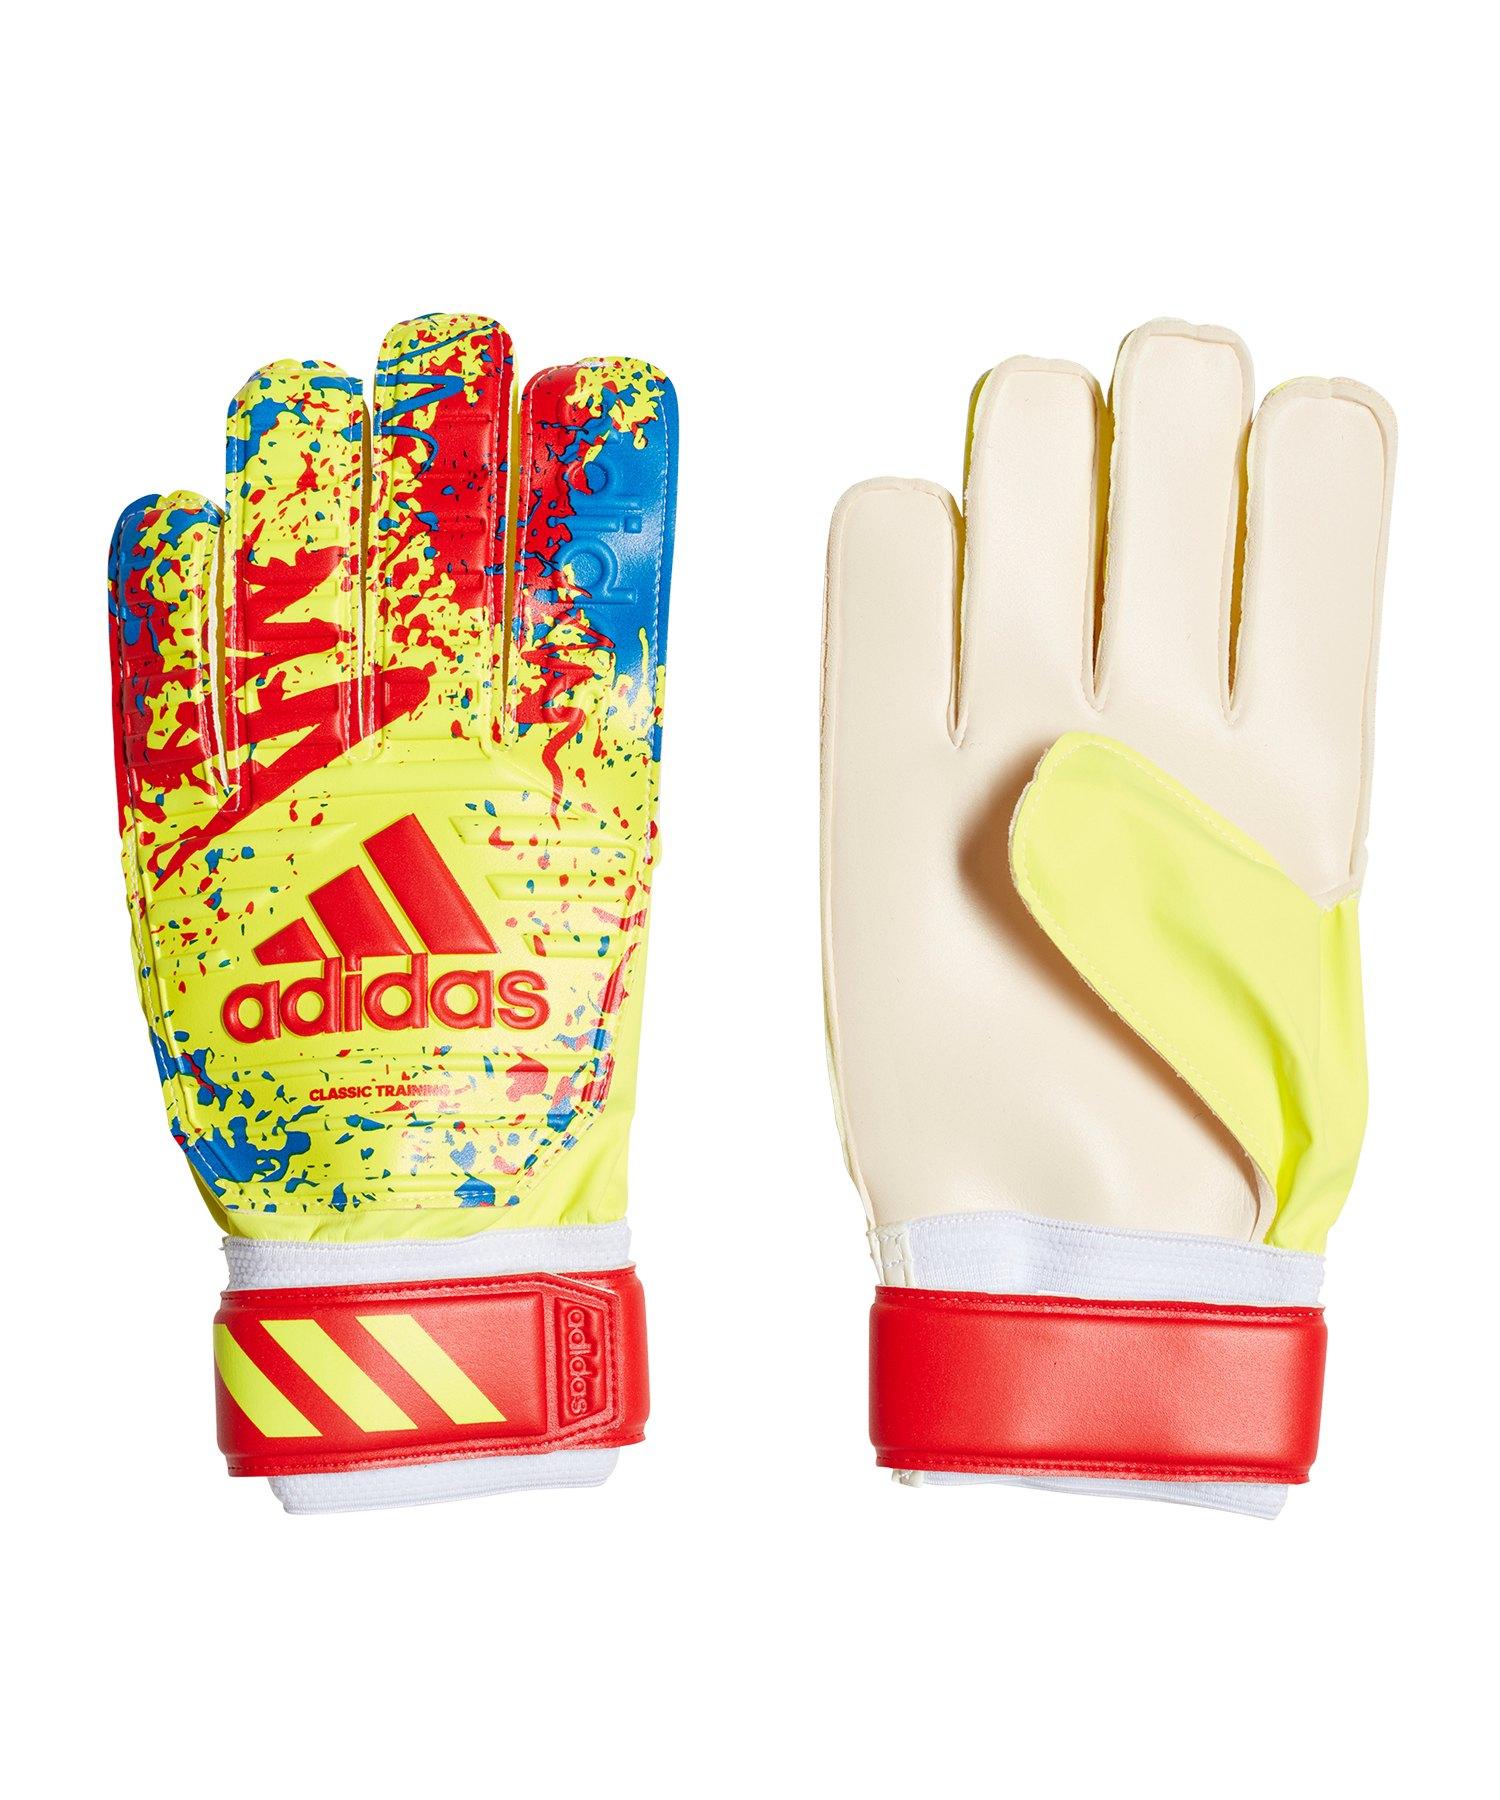 adidas Classic Training TW-Handschuh Gelb Rot - gelb